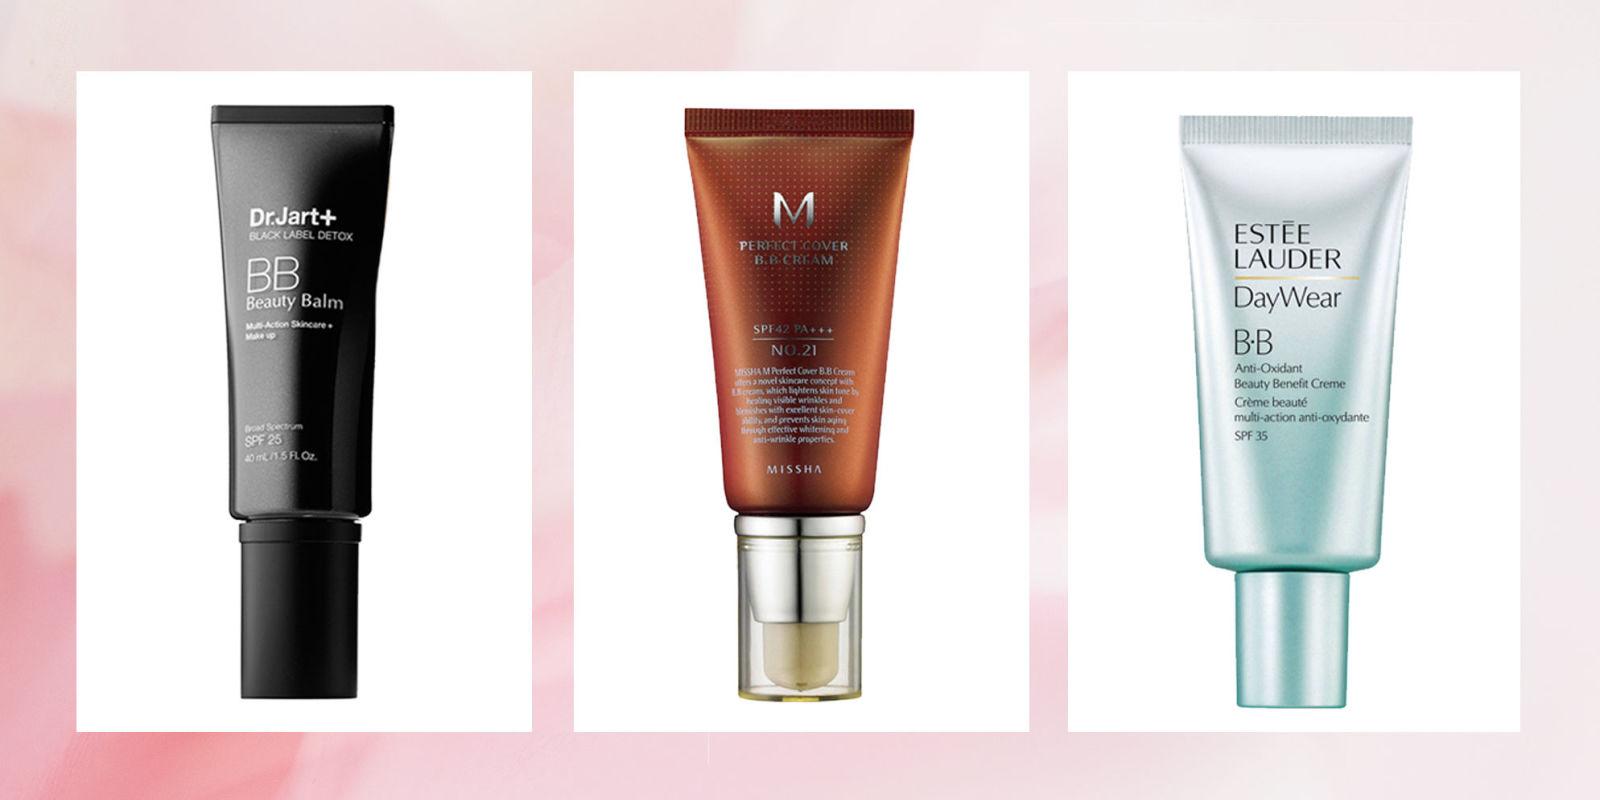 13 best bb creams beauty balm cream reviews